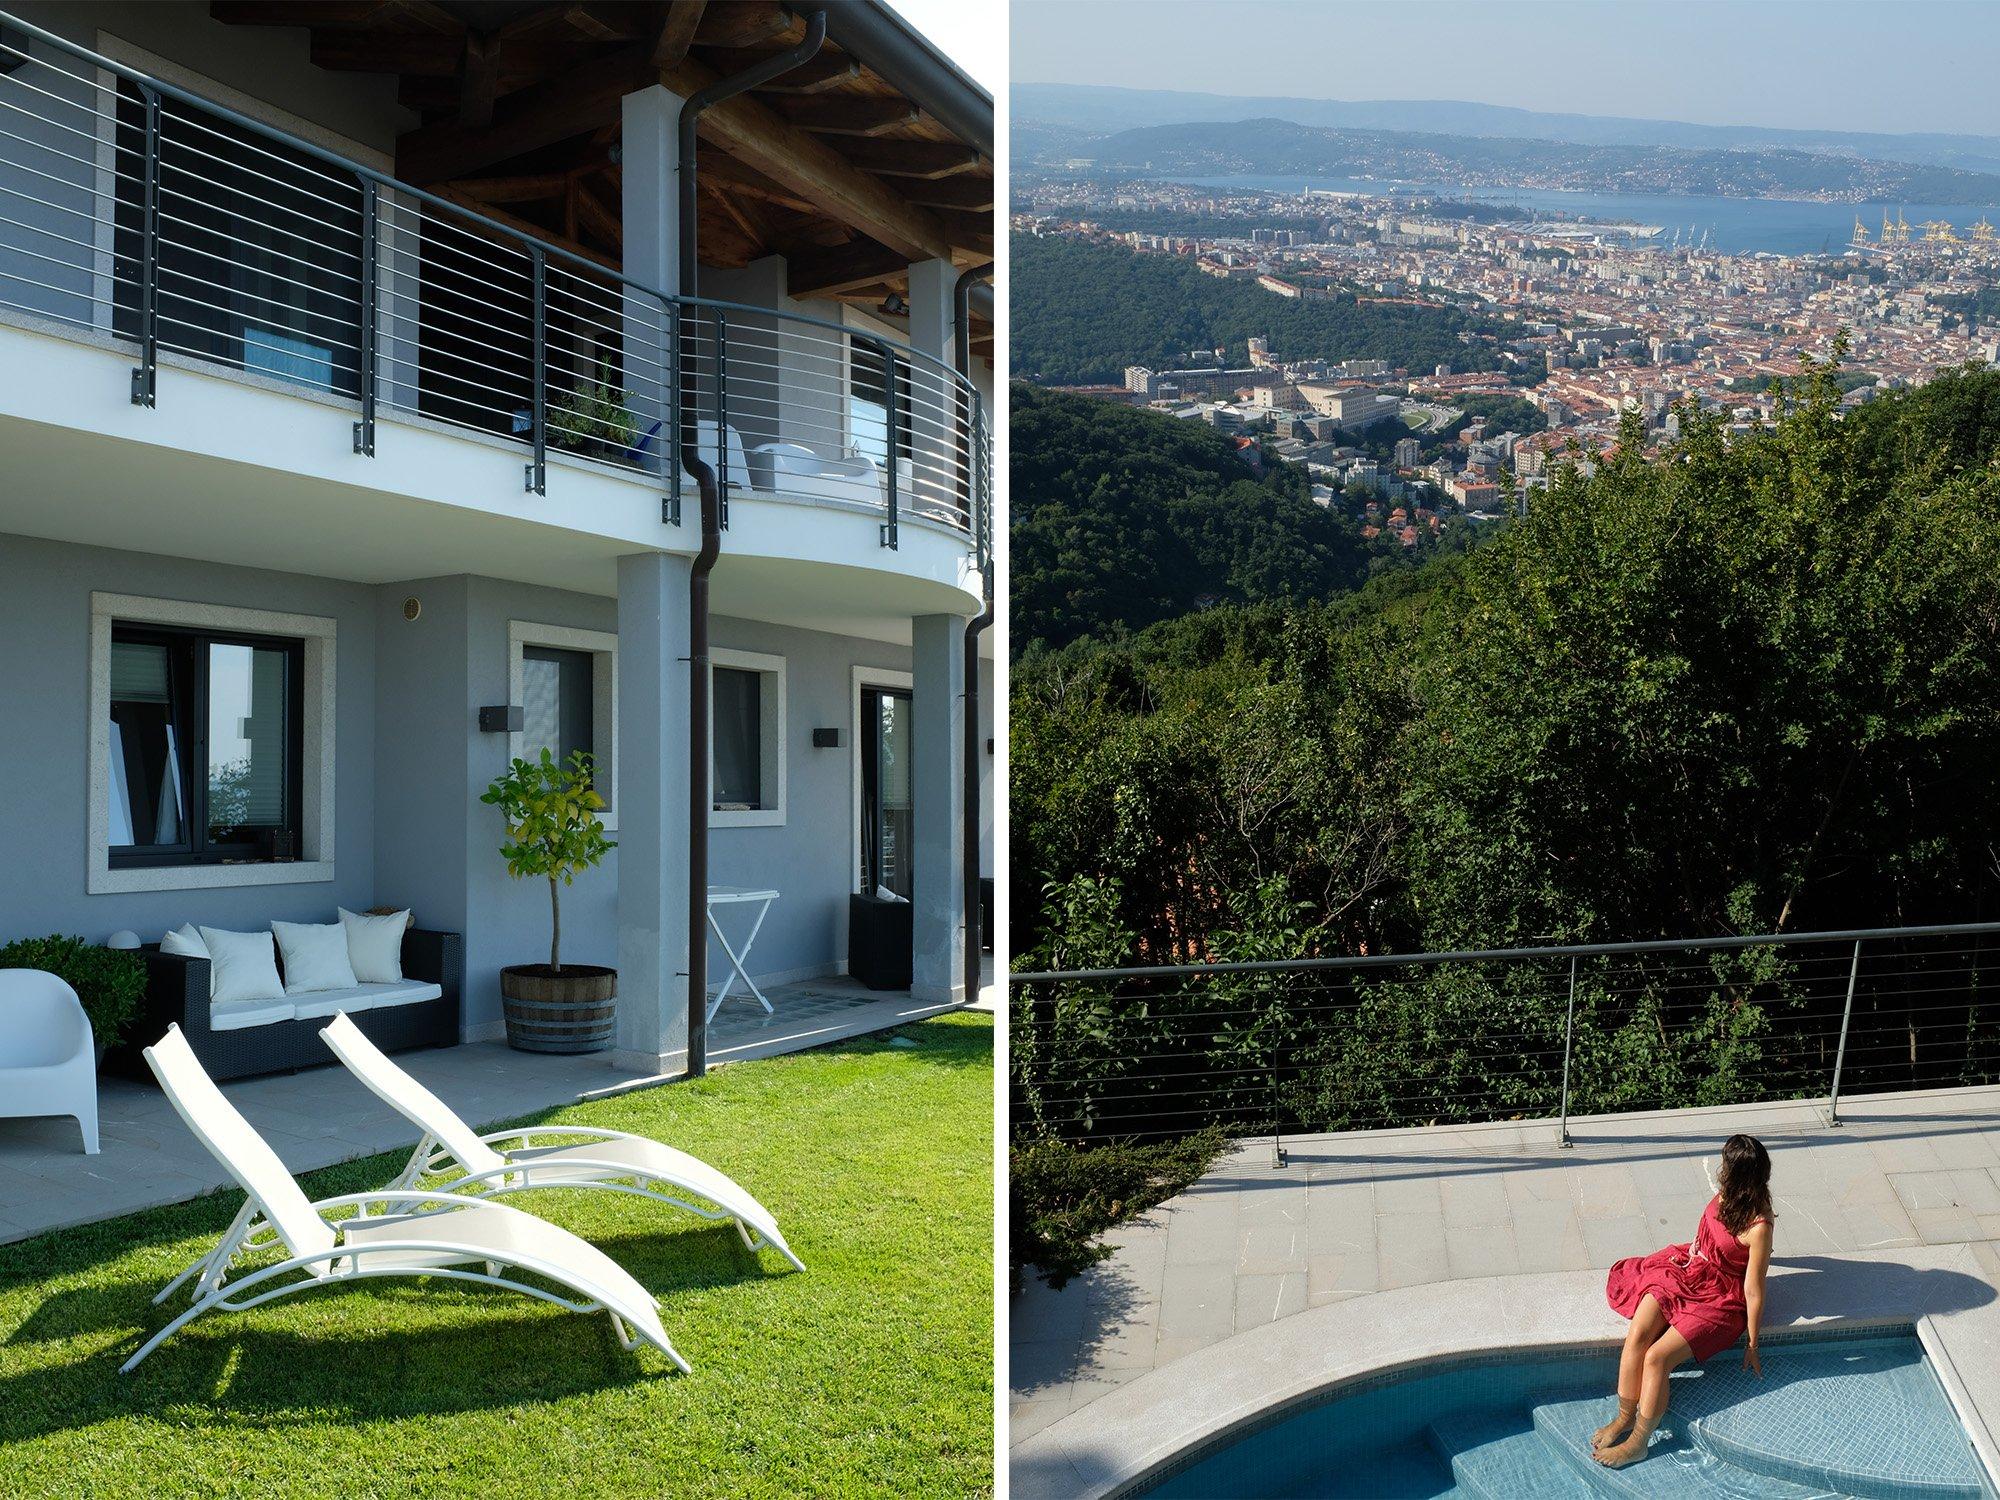 bnb villa bella vista WEEKEND A TRIESTE